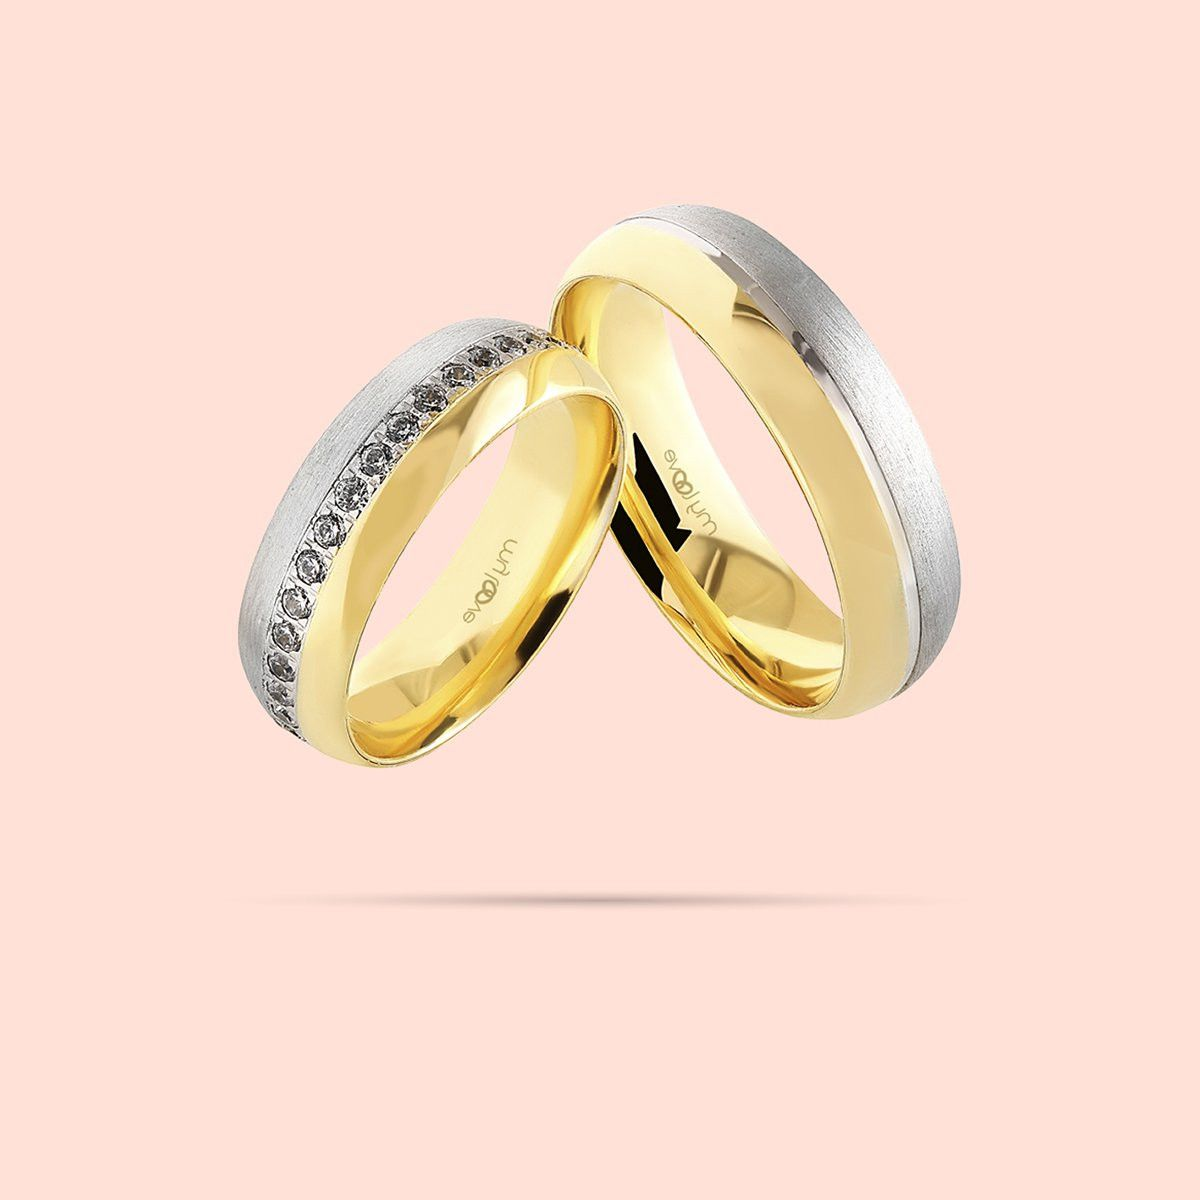 Alyans Modelleri 2018 | Alyans Modelleri | Pinterest